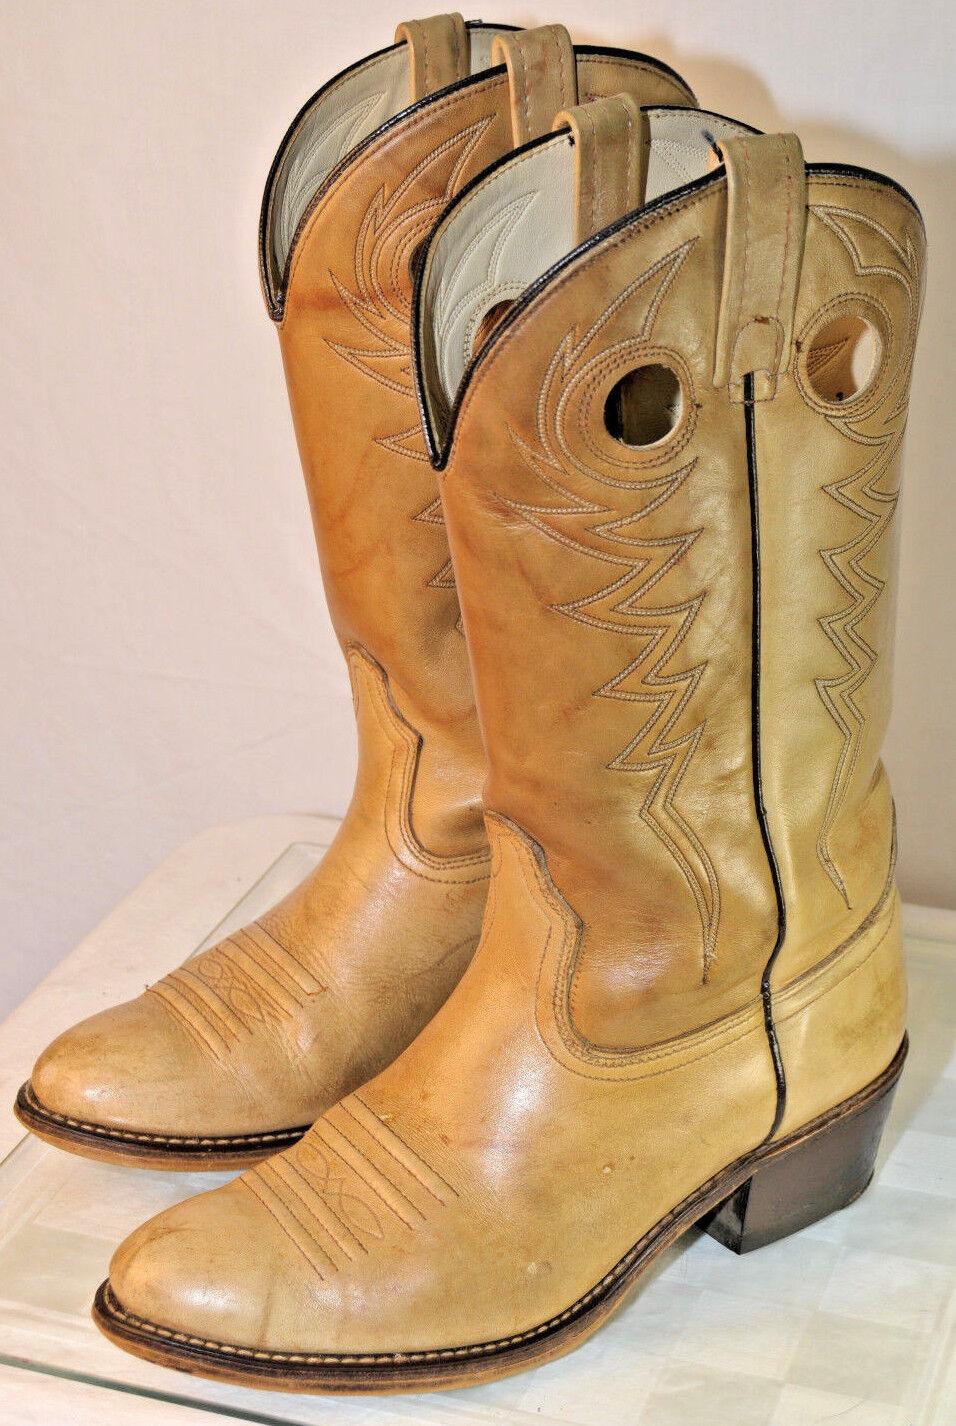 ACME Cowboy Western Boots Tan Men's Sz 8.5 E Leather Upper & Soles